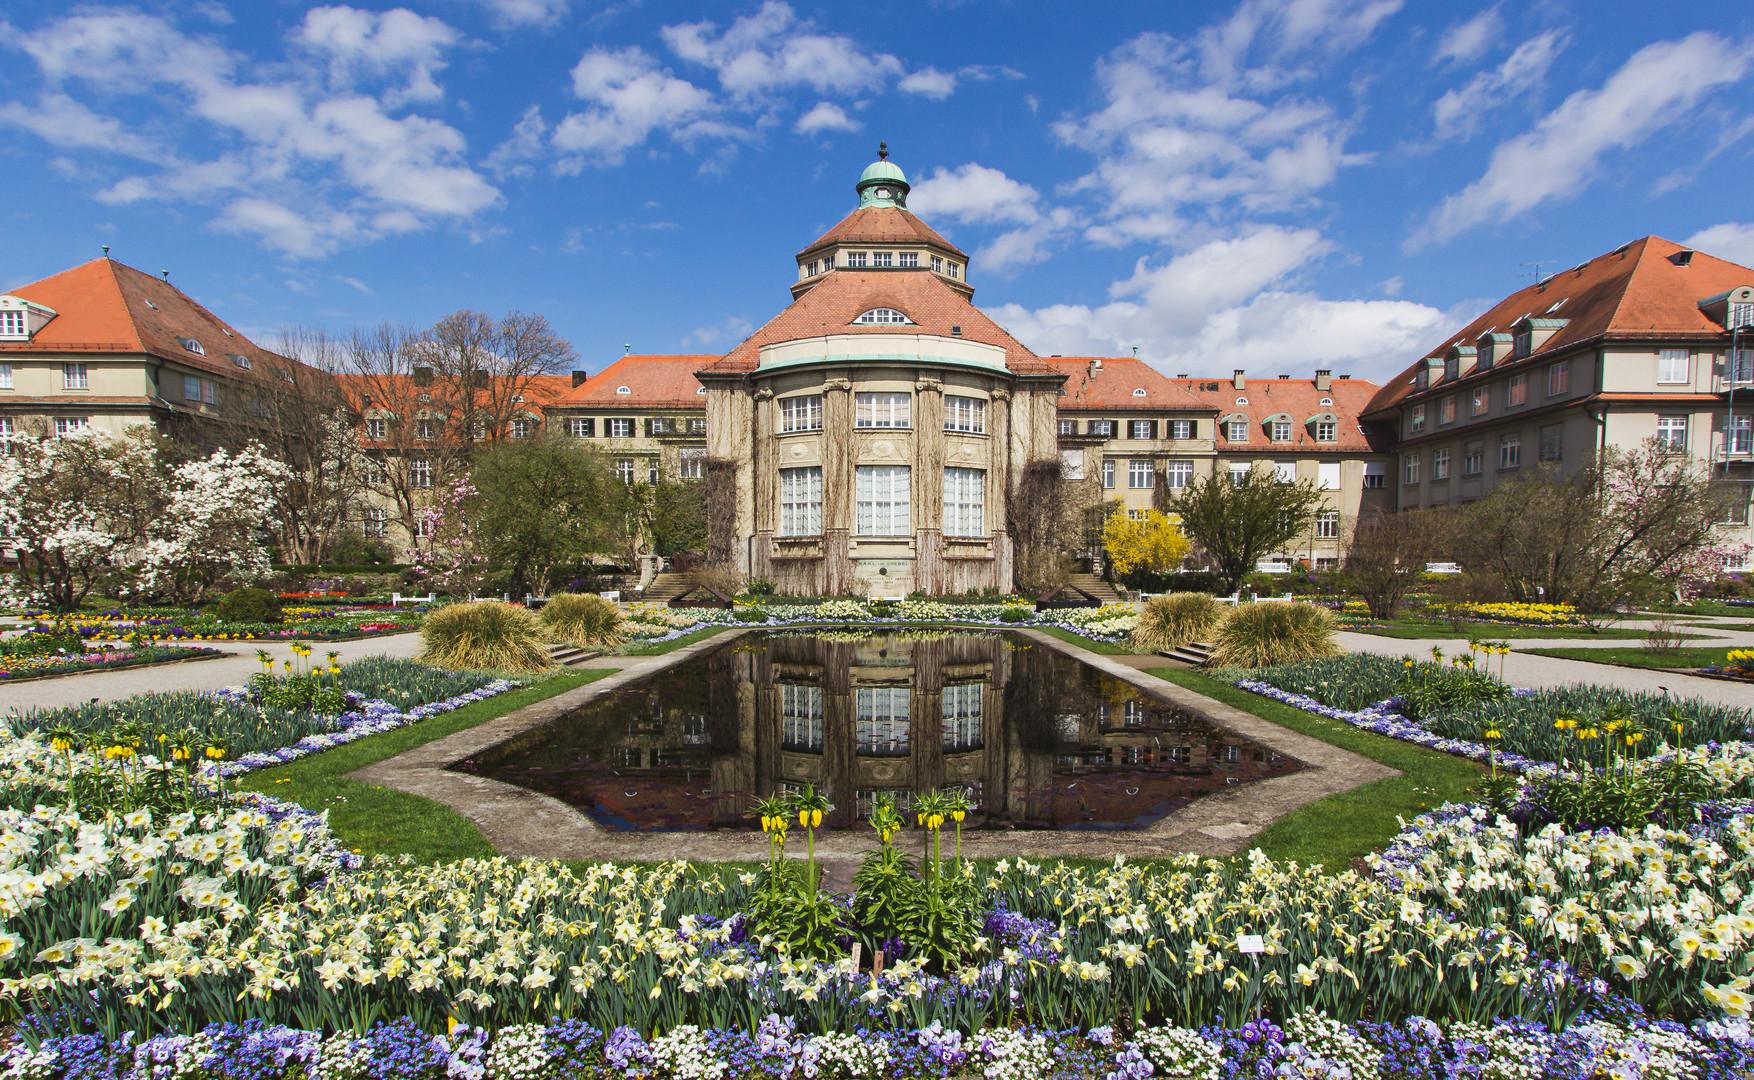 20 Besten Botanischer Garten München Beste Wohnkultur Bastelideen